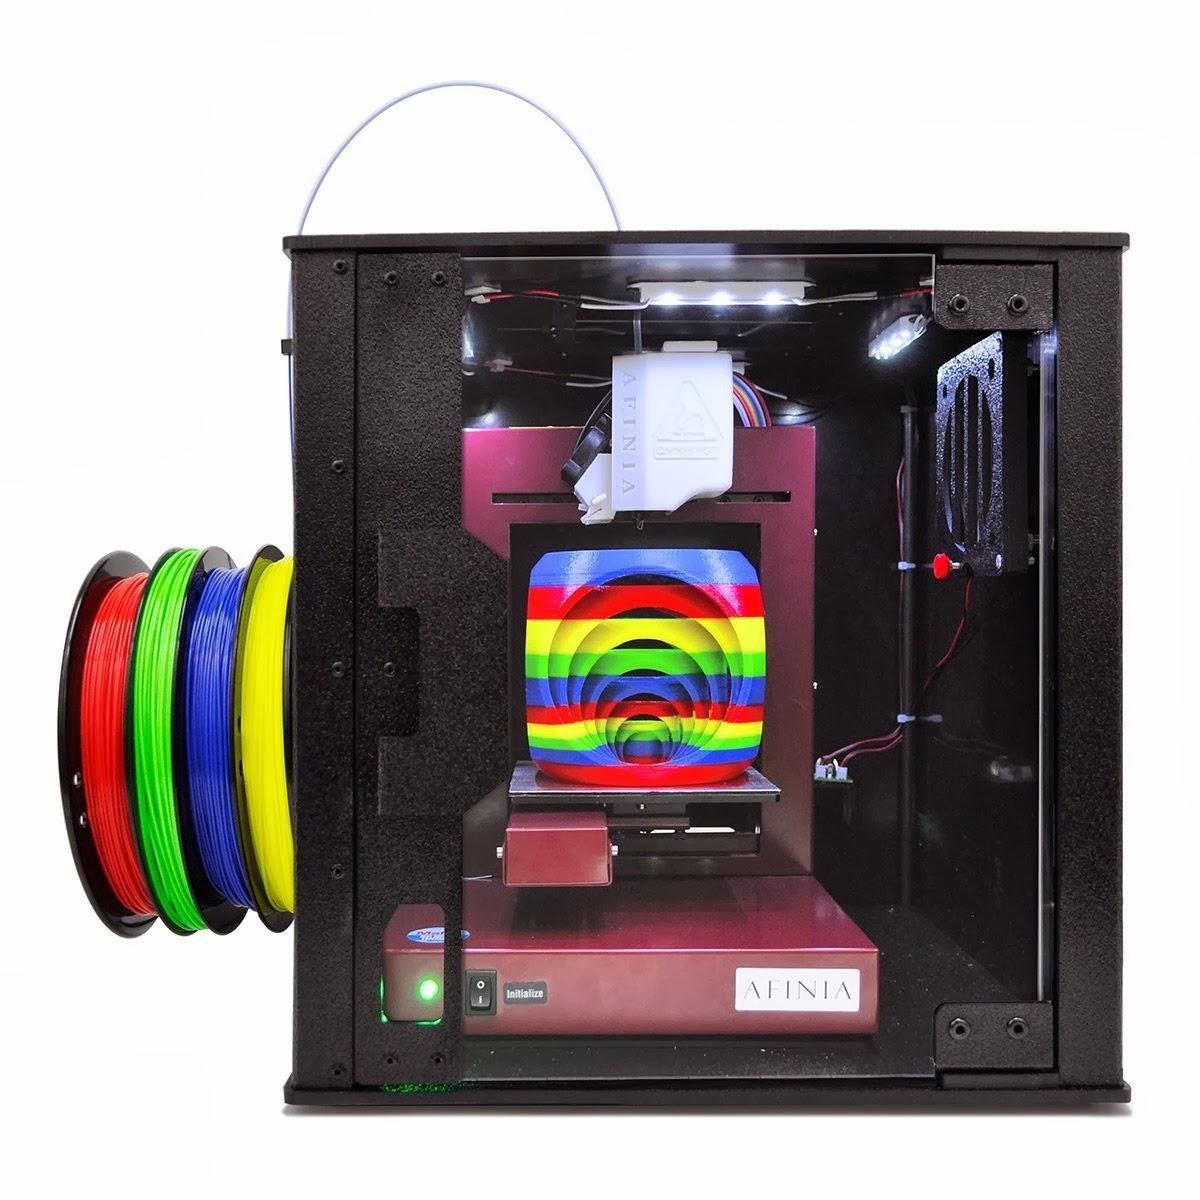 3d Printer Accessories: 3D Printer Enclosure By Octave